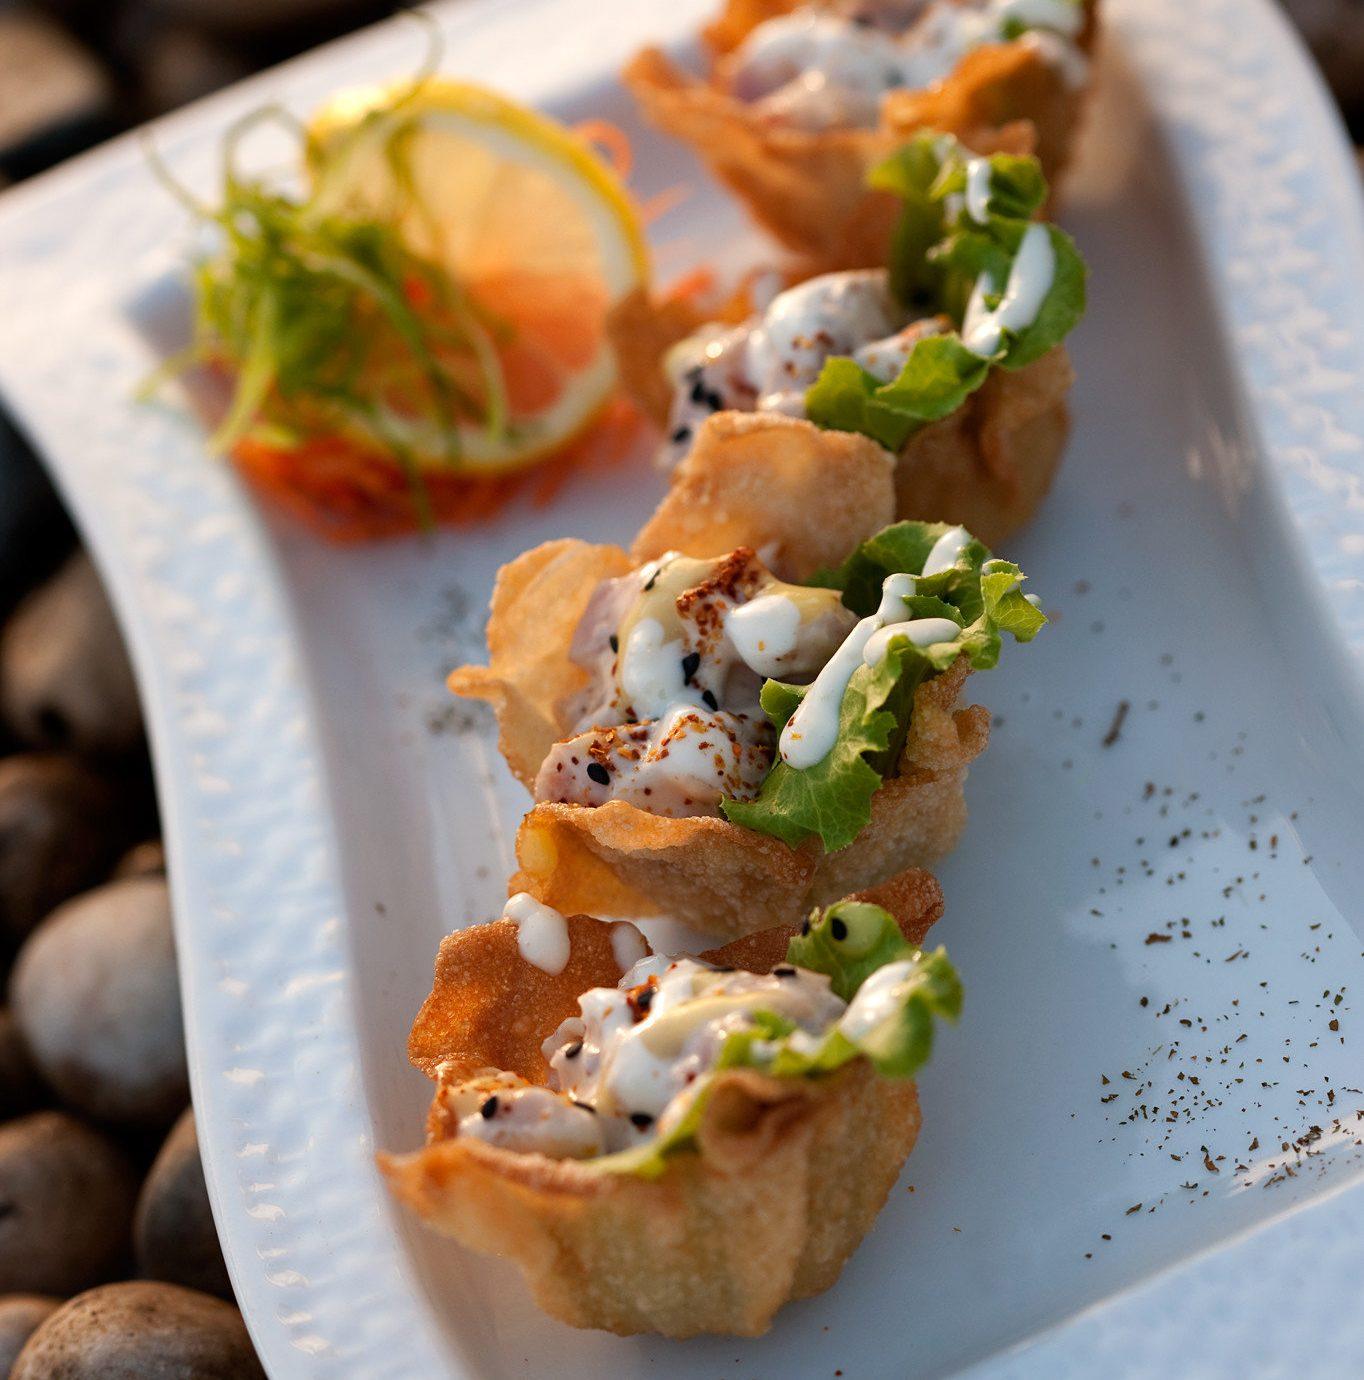 food plate bruschetta cuisine vegetable meat